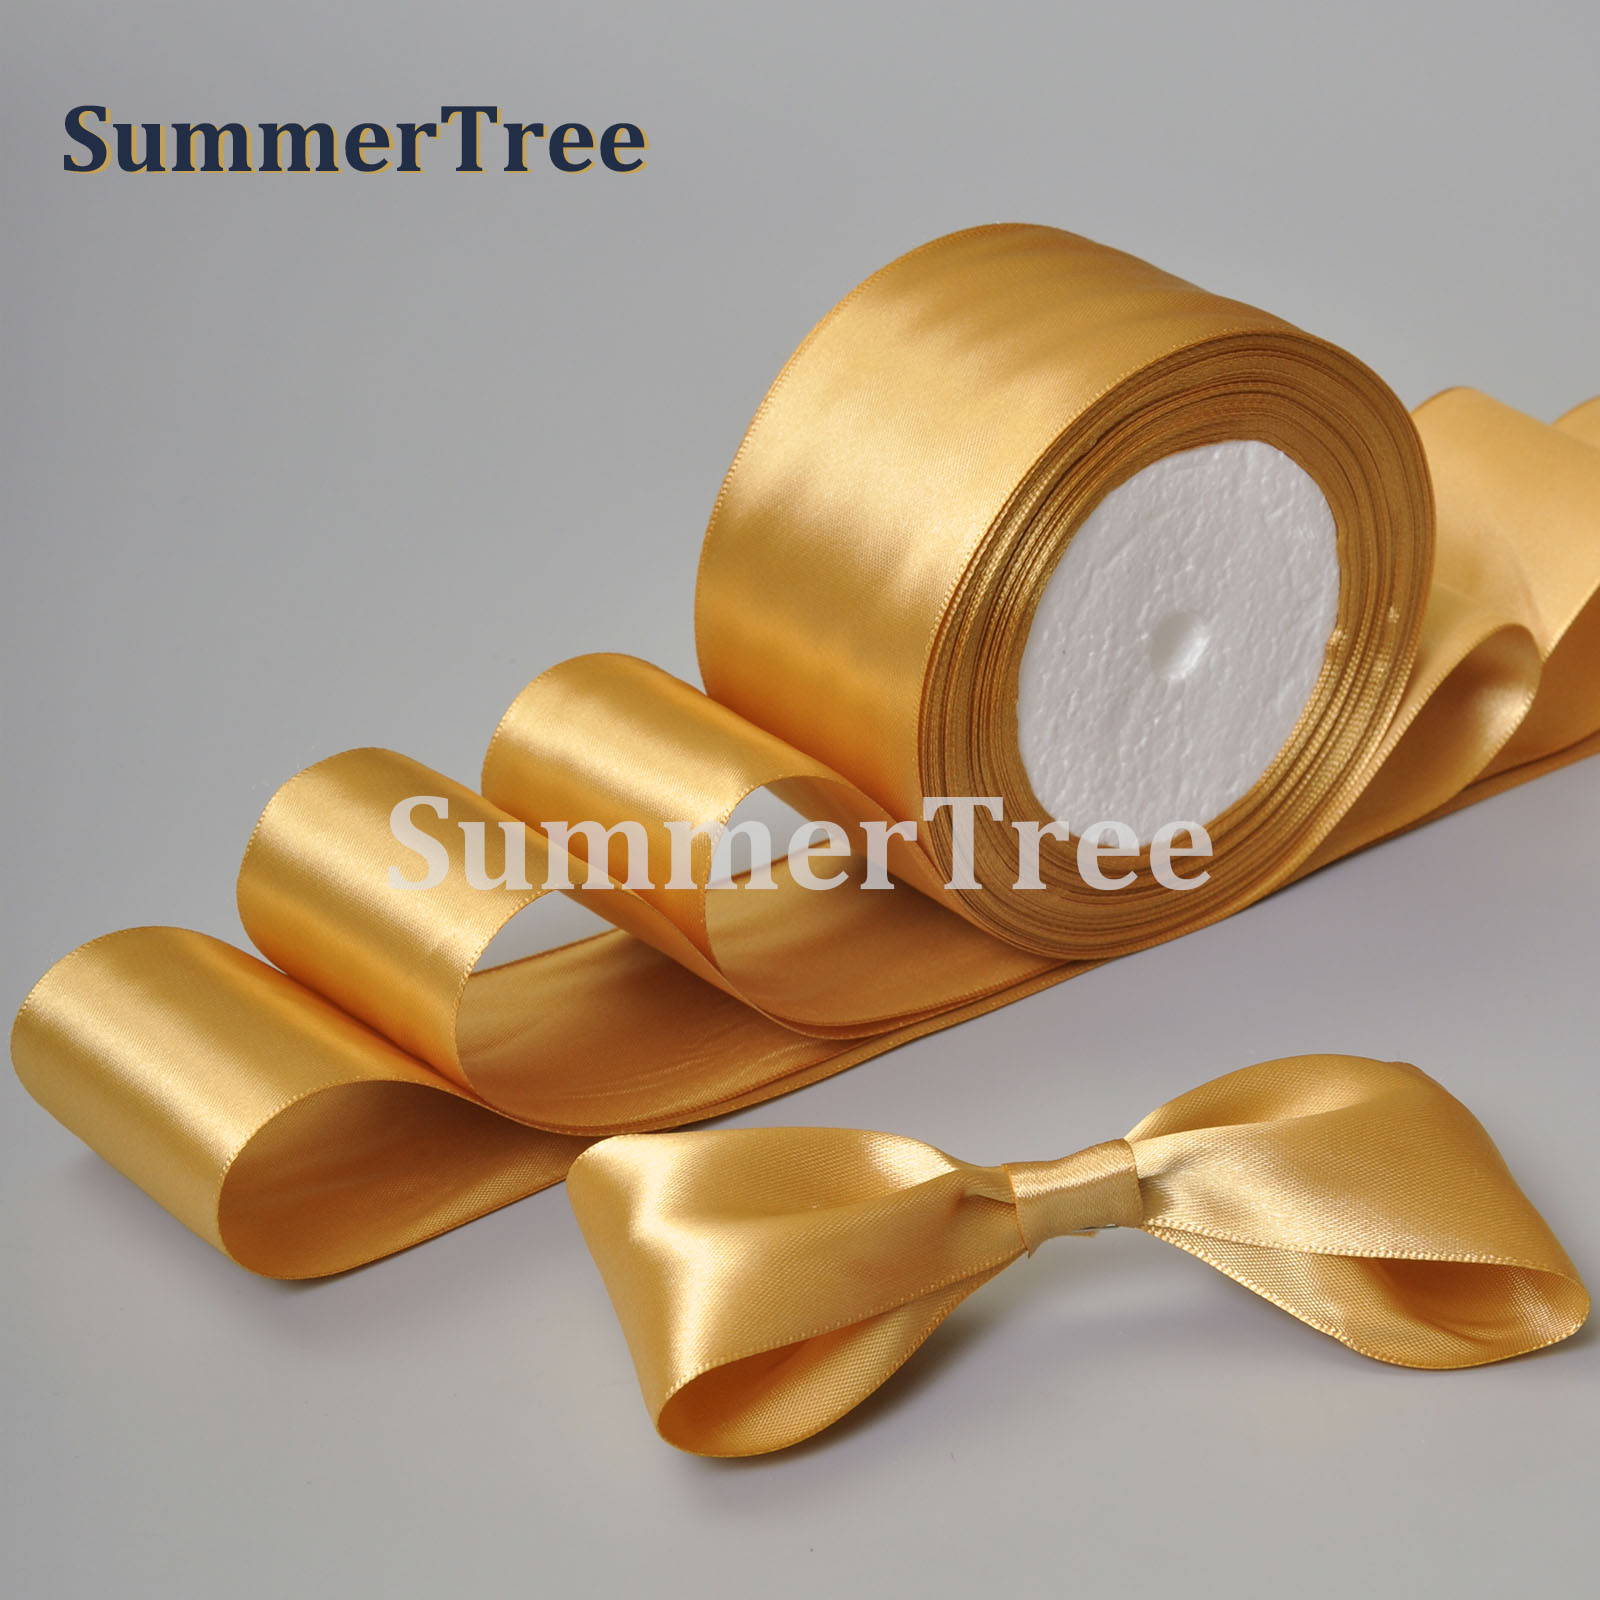 Gold 25yards 6mm 10mm 15mm 25mm 38mm 50mm Satin Ribbon Sash Gift Bow Handmade DIY Craft Wedding Party Supply Banquet Decoration